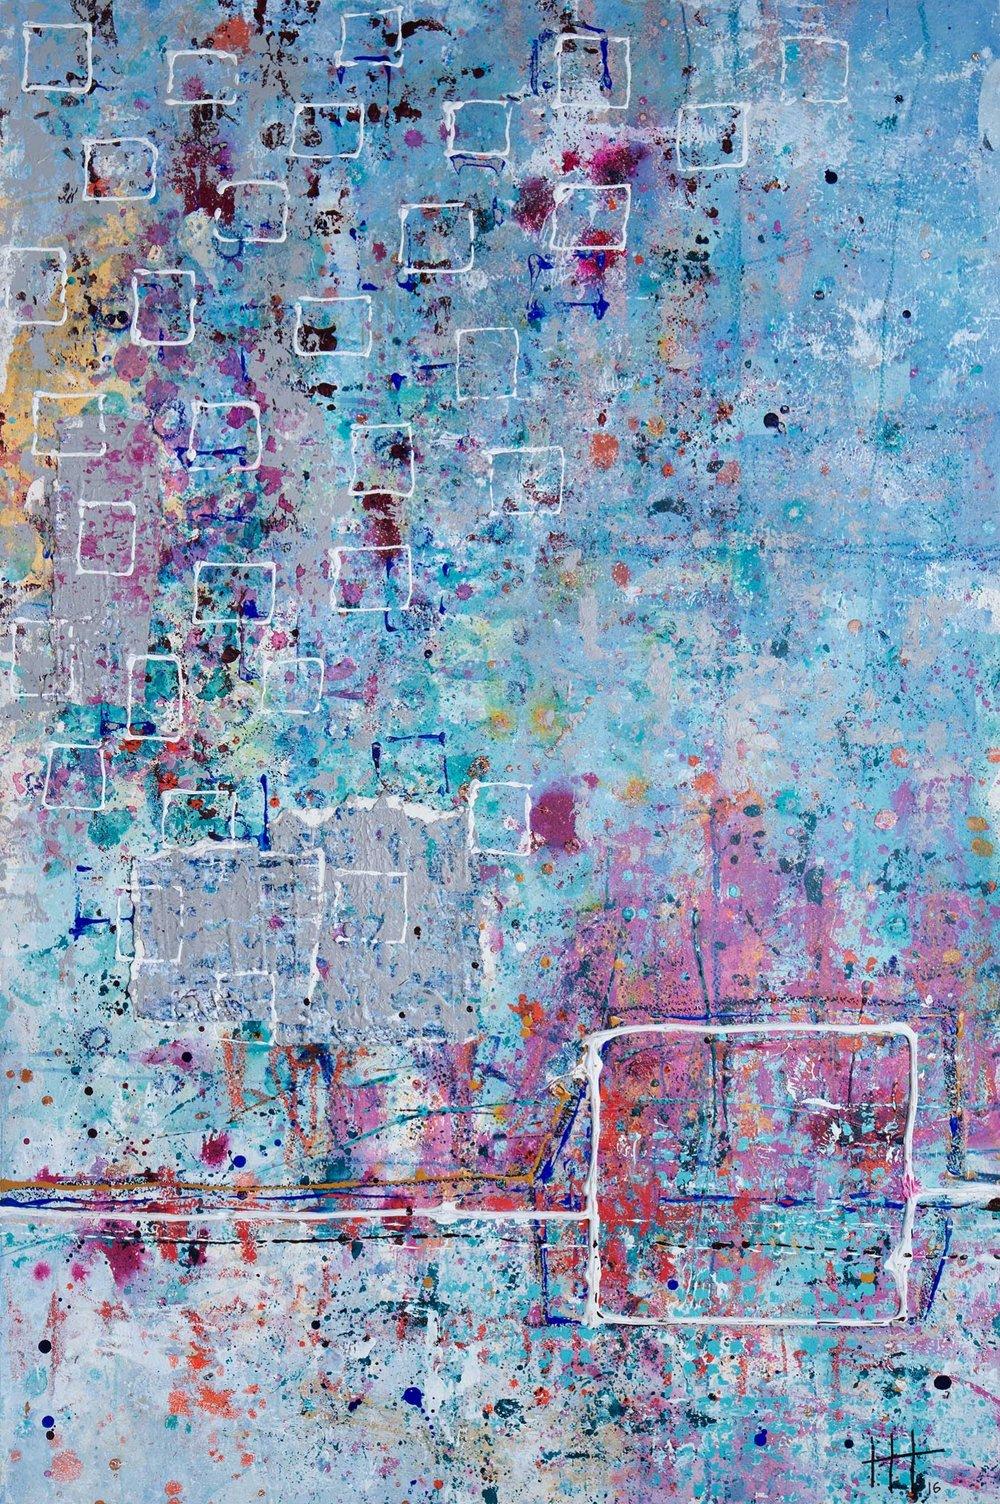 'Studio Days' Acrylic & Mixed Media / 129cm x 93cm (framed) SOLD